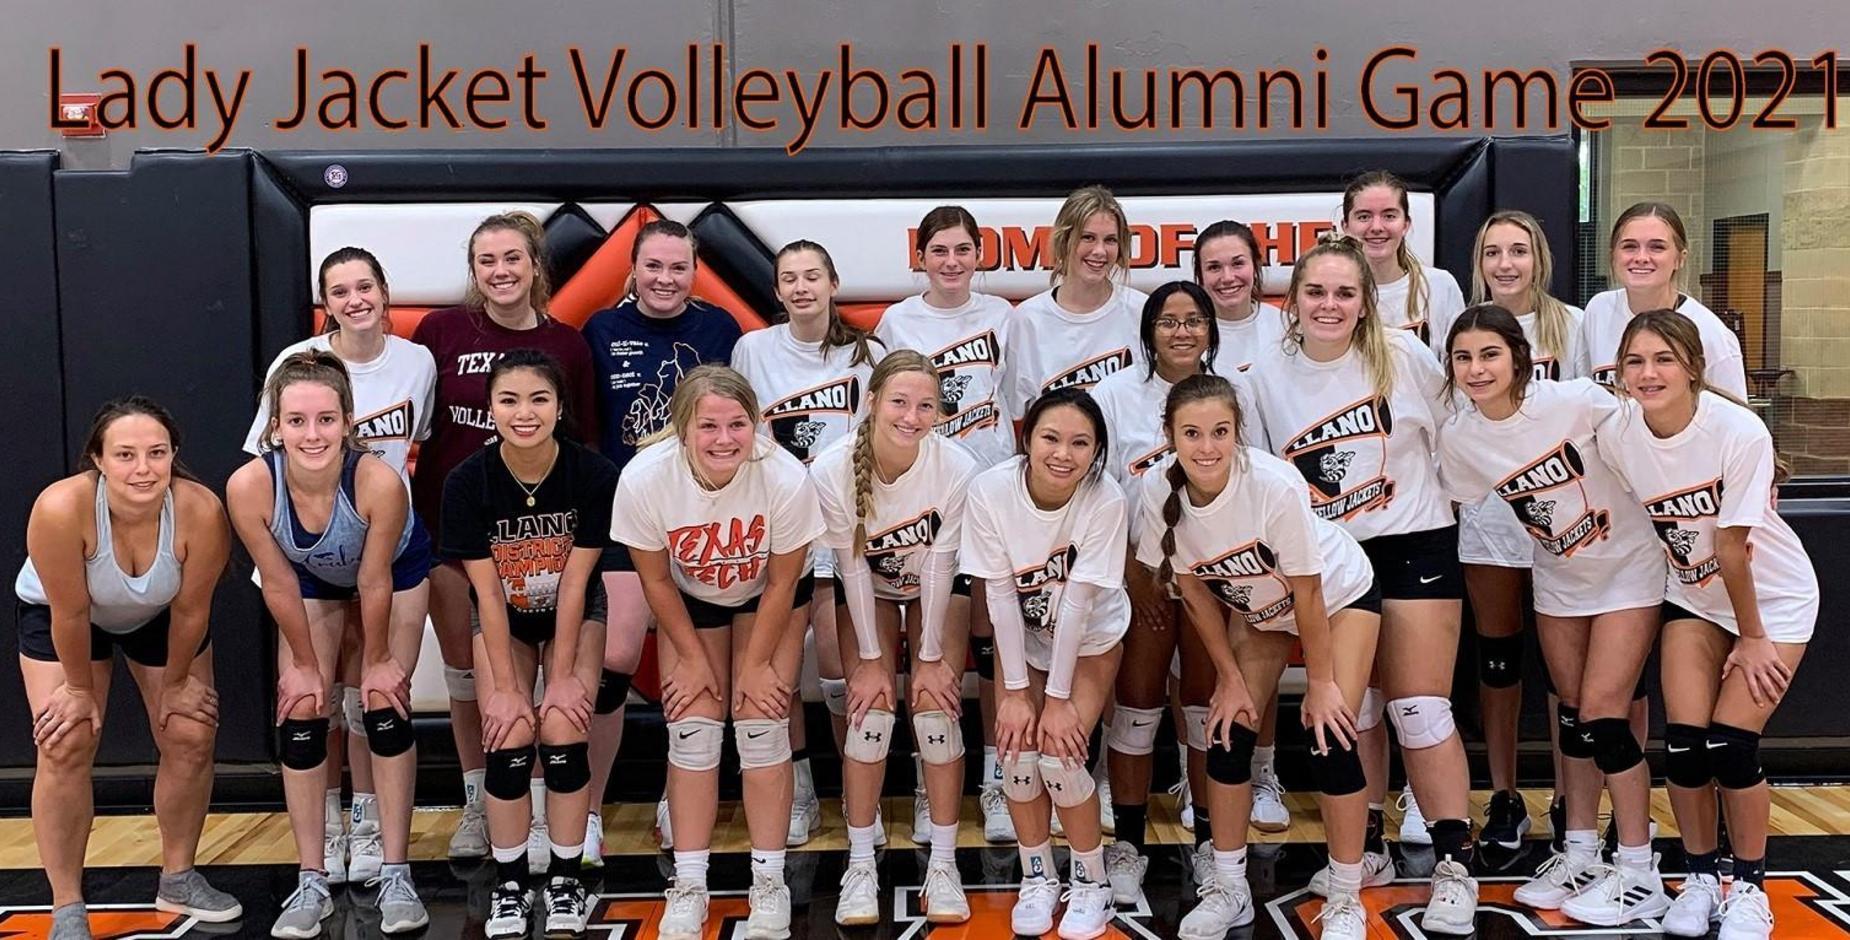 Volleyball Alumni Game 2021